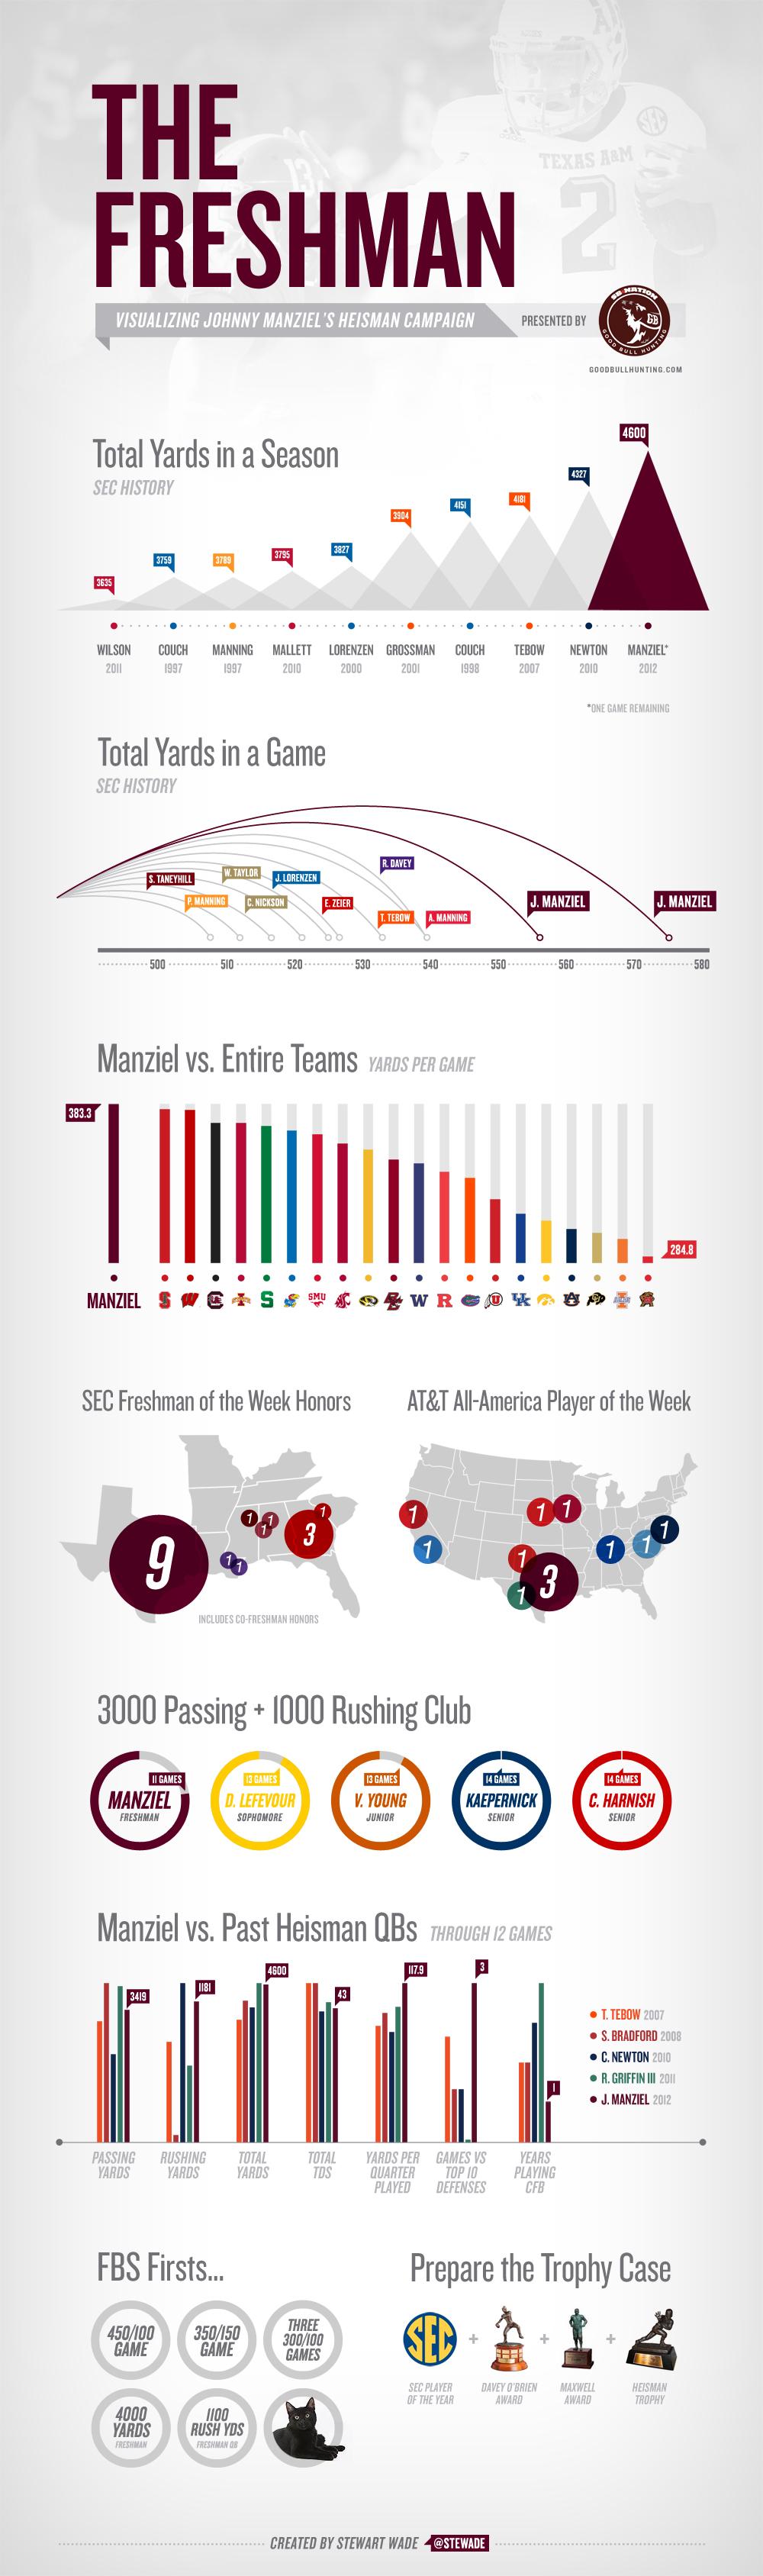 Johnny Manziel infographic